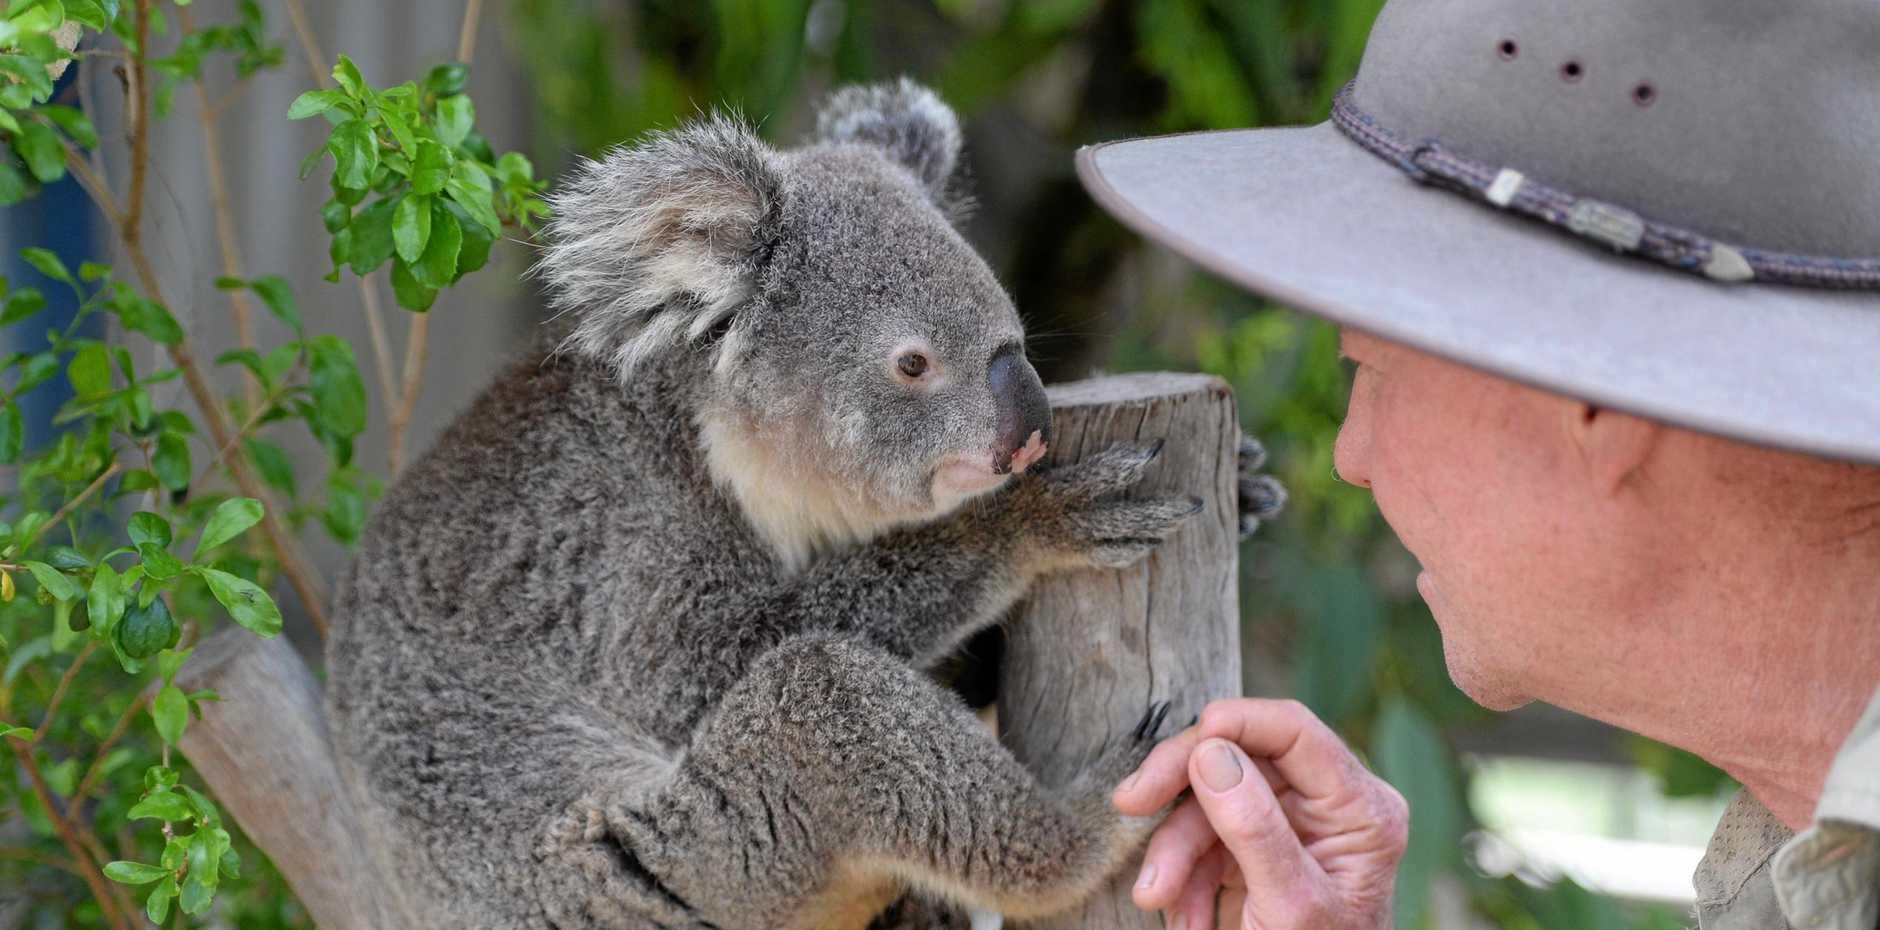 ROCKHAMPTON ZOO: Novatel a resident koala and Life Science Coordinator Graeme Strachan.